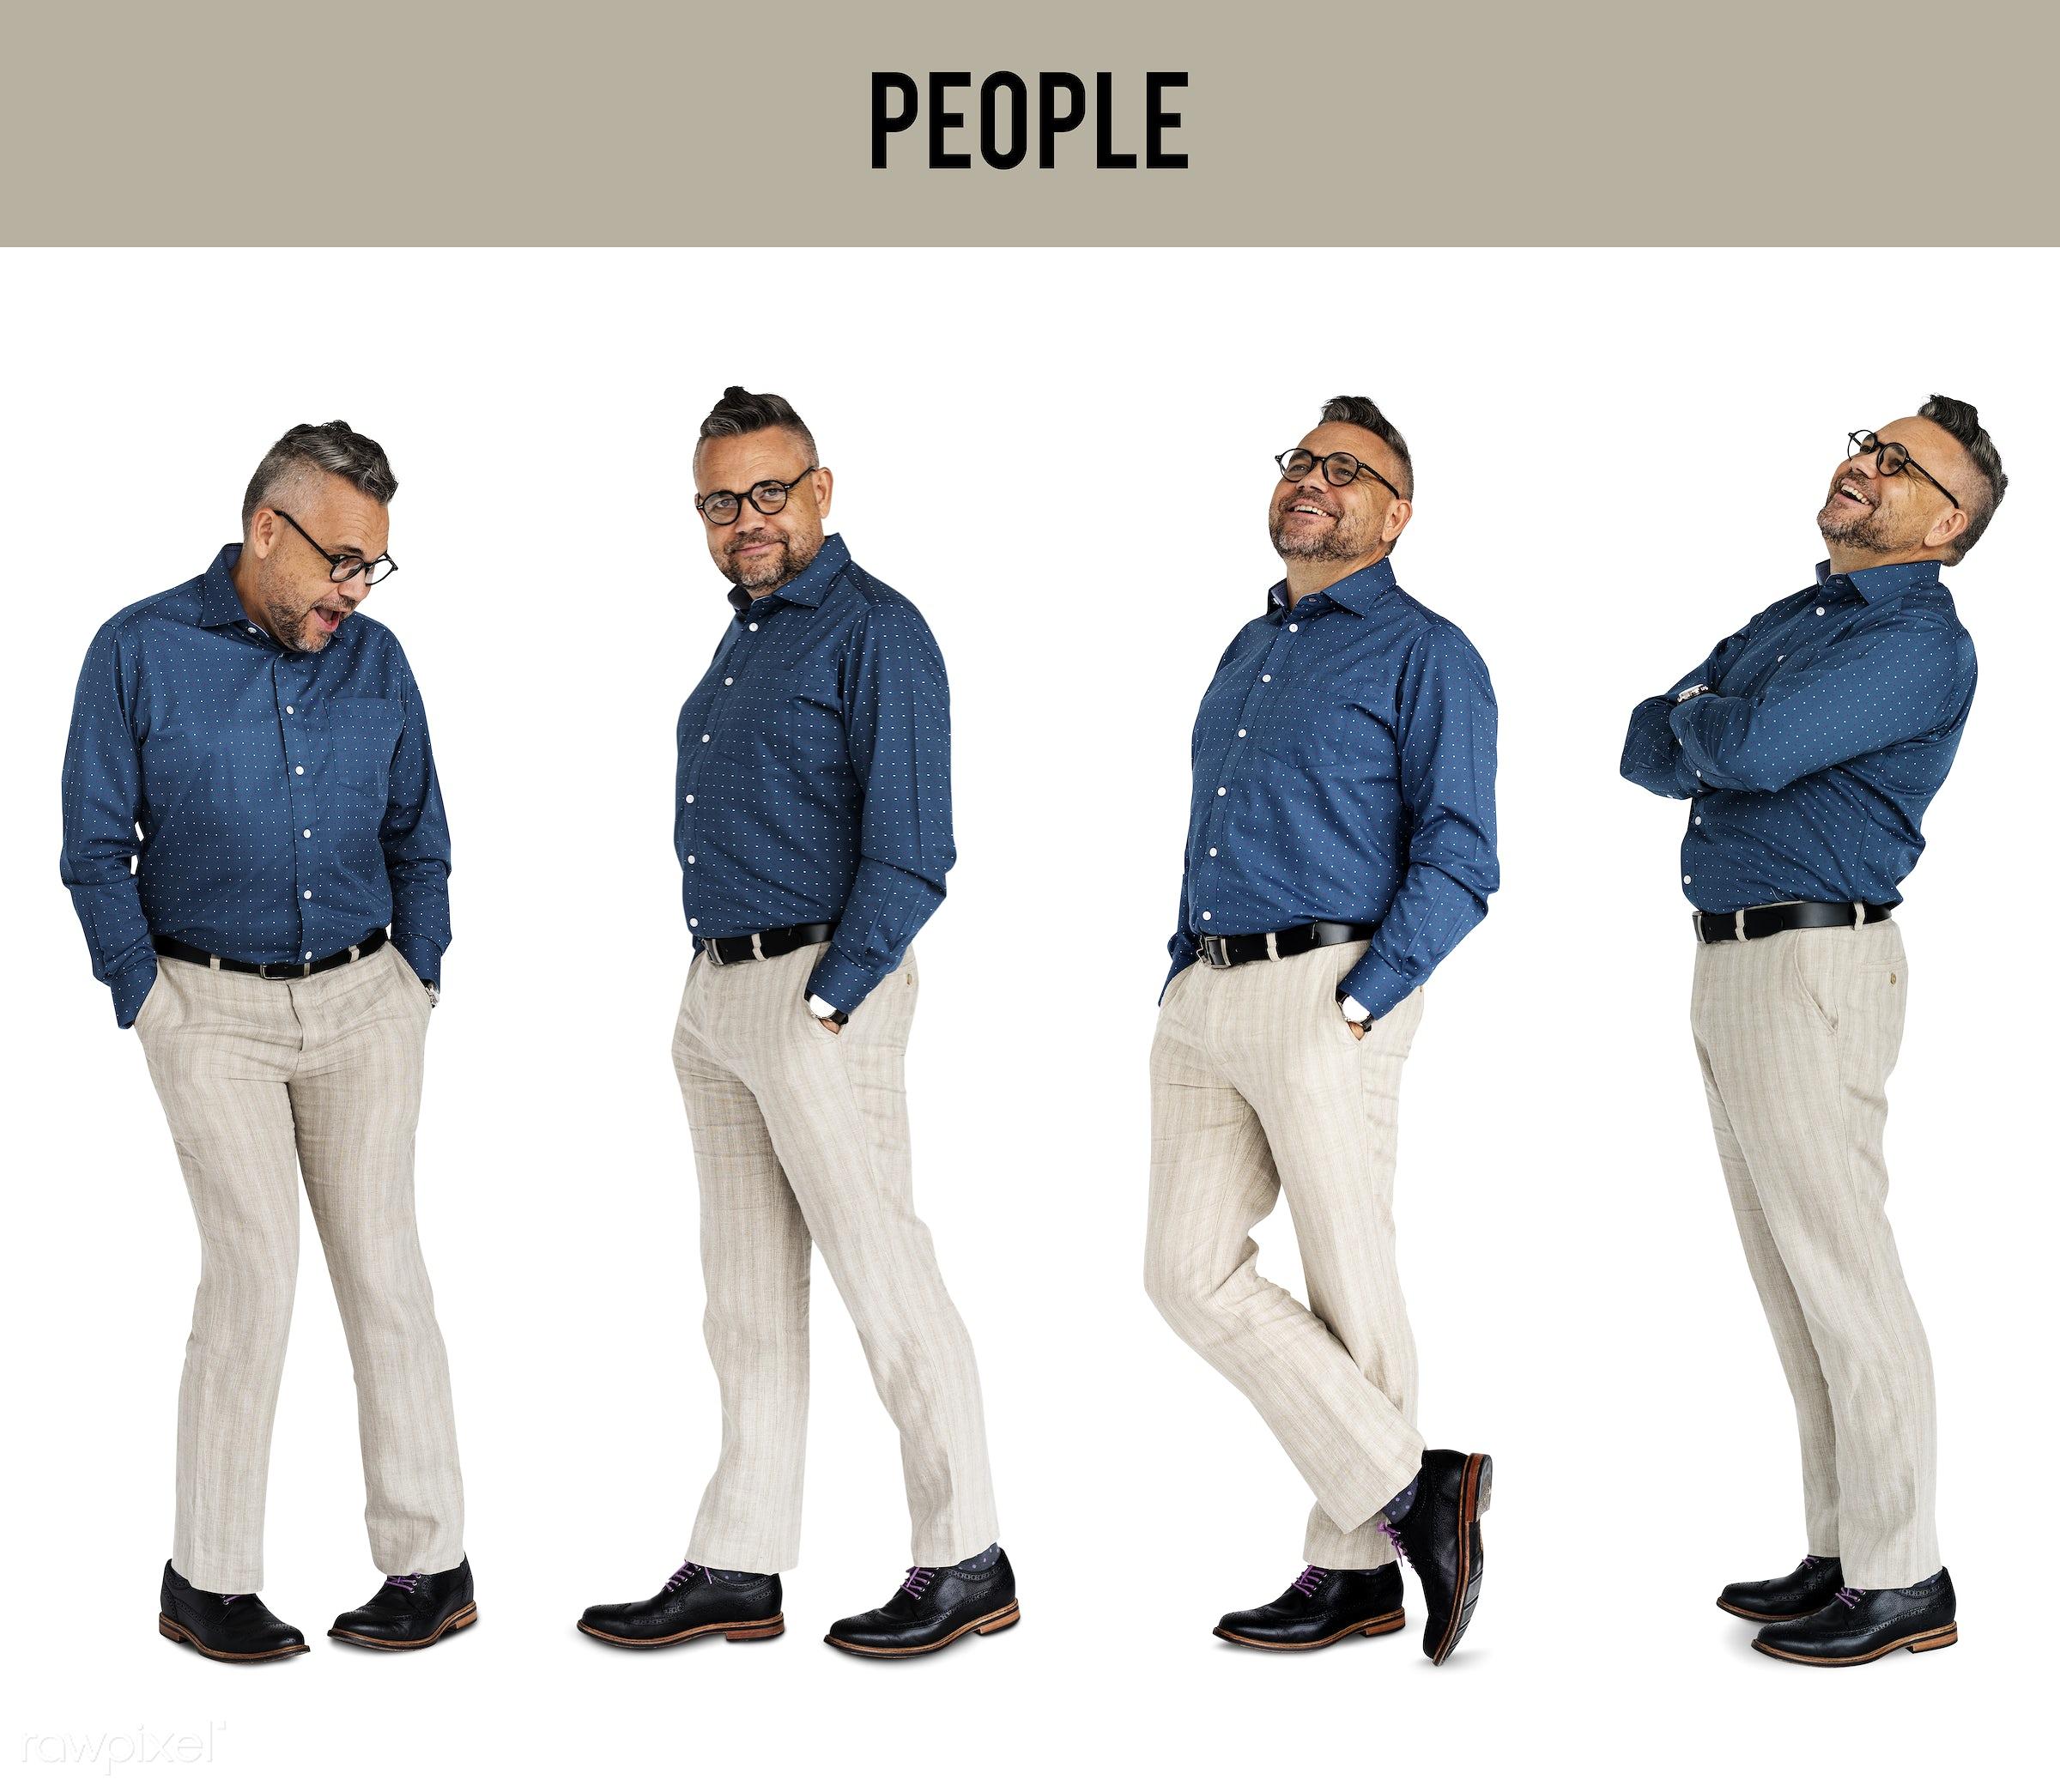 Diverse people set - gentlemen, studio, person, glasses, diverse, relax, set, collection, people, hispanic, attraction, life...